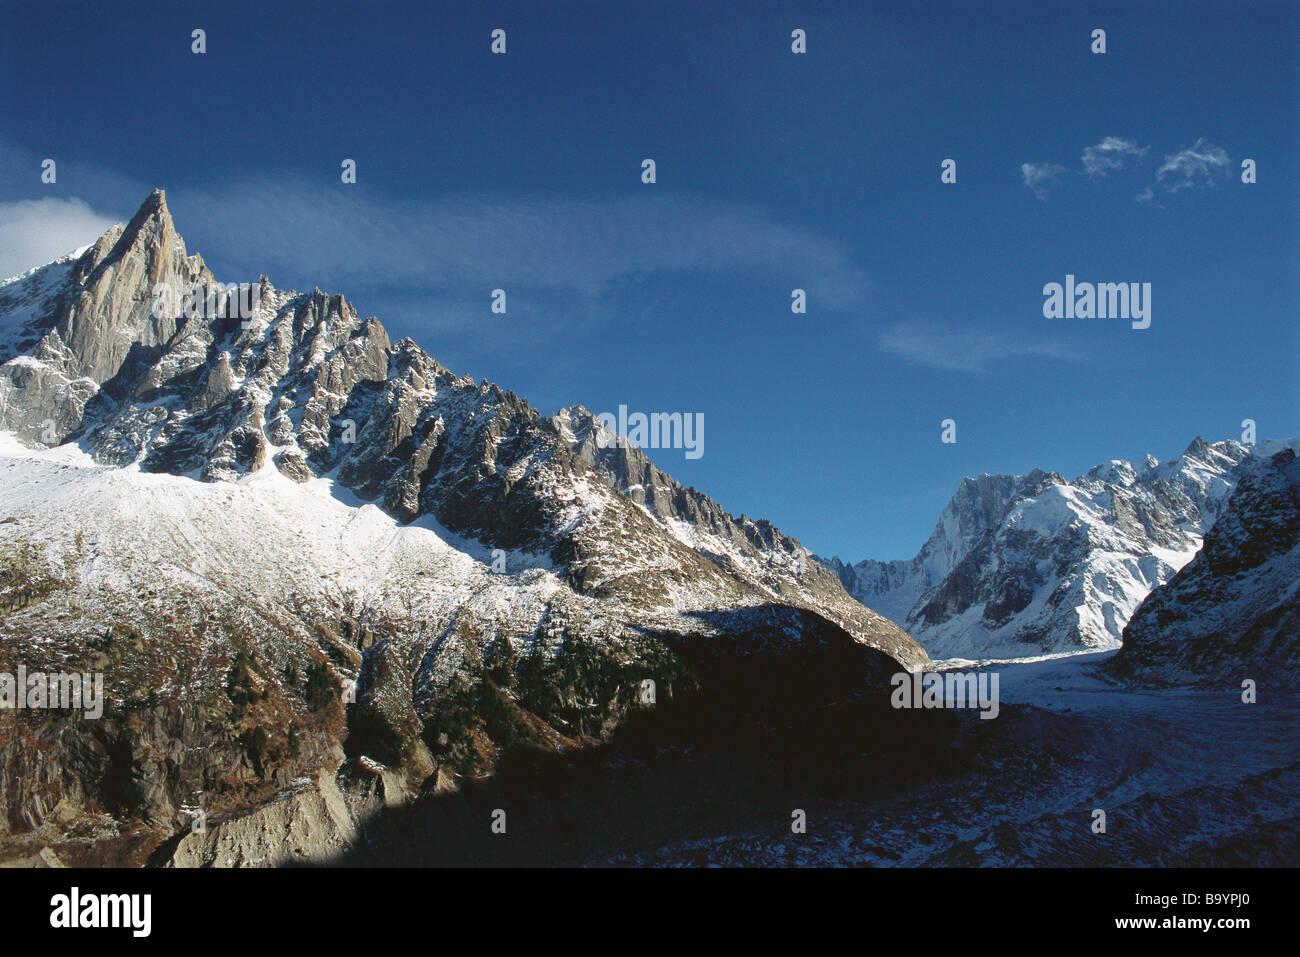 Mont-Blanc-Massiv, schneebedeckte Berge in den Alpen Stockbild